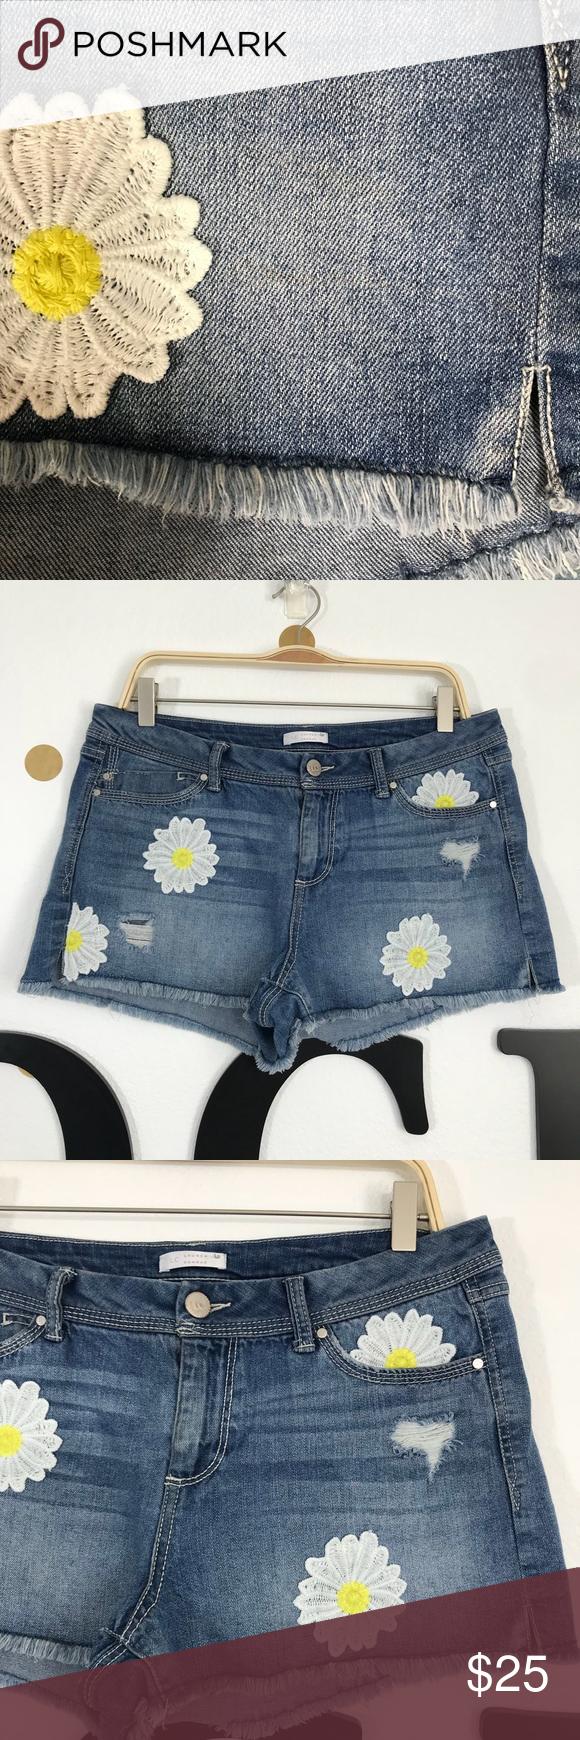 Lauren Conrad 12 Denim Shorts Daisy Flower Size 12 Clothes Design Fashion Design Fashion Trends